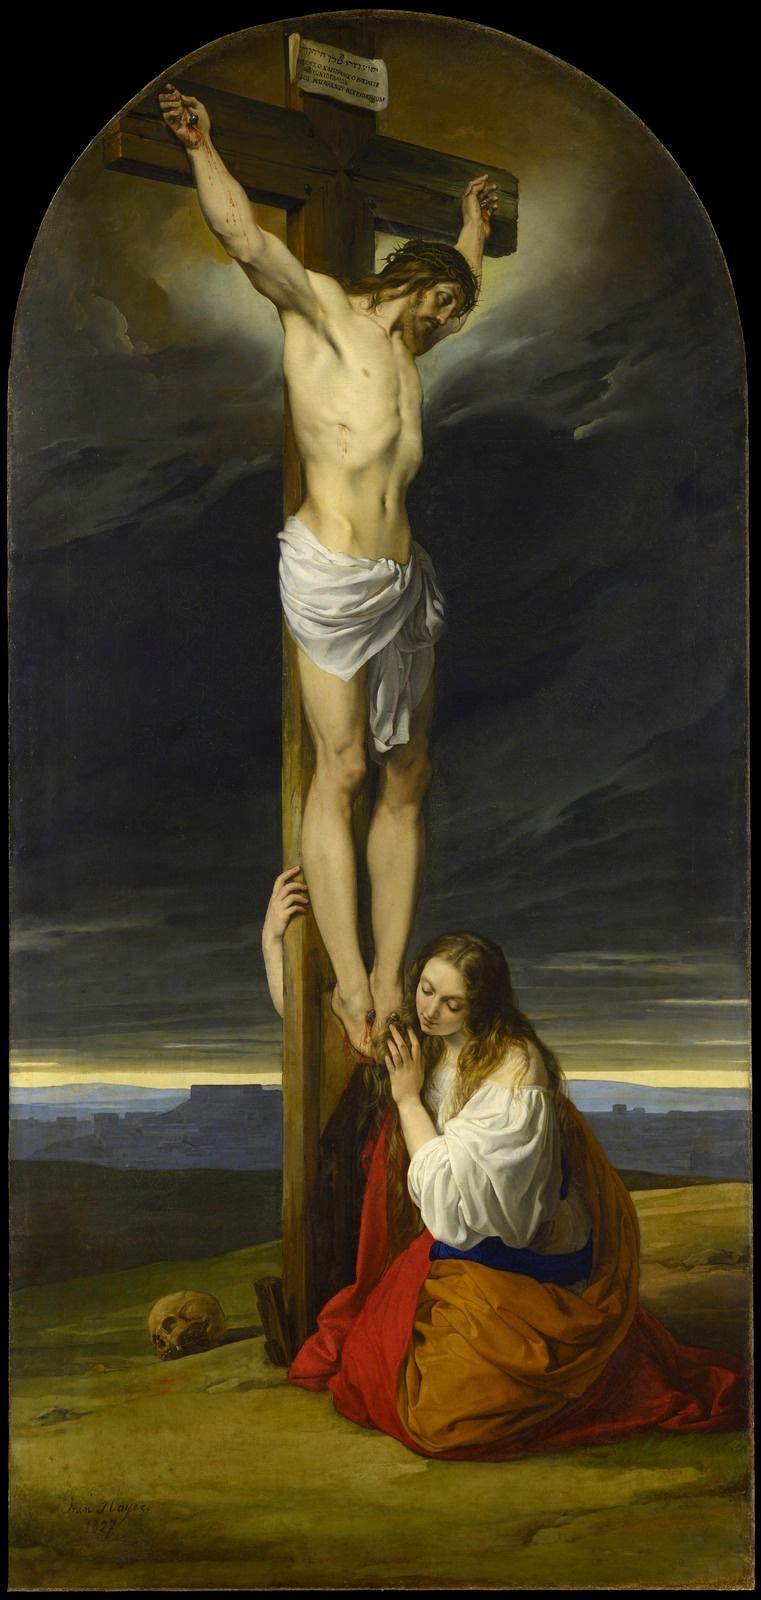 Francesco Ayets. Crucifixion with Mary Magdalene